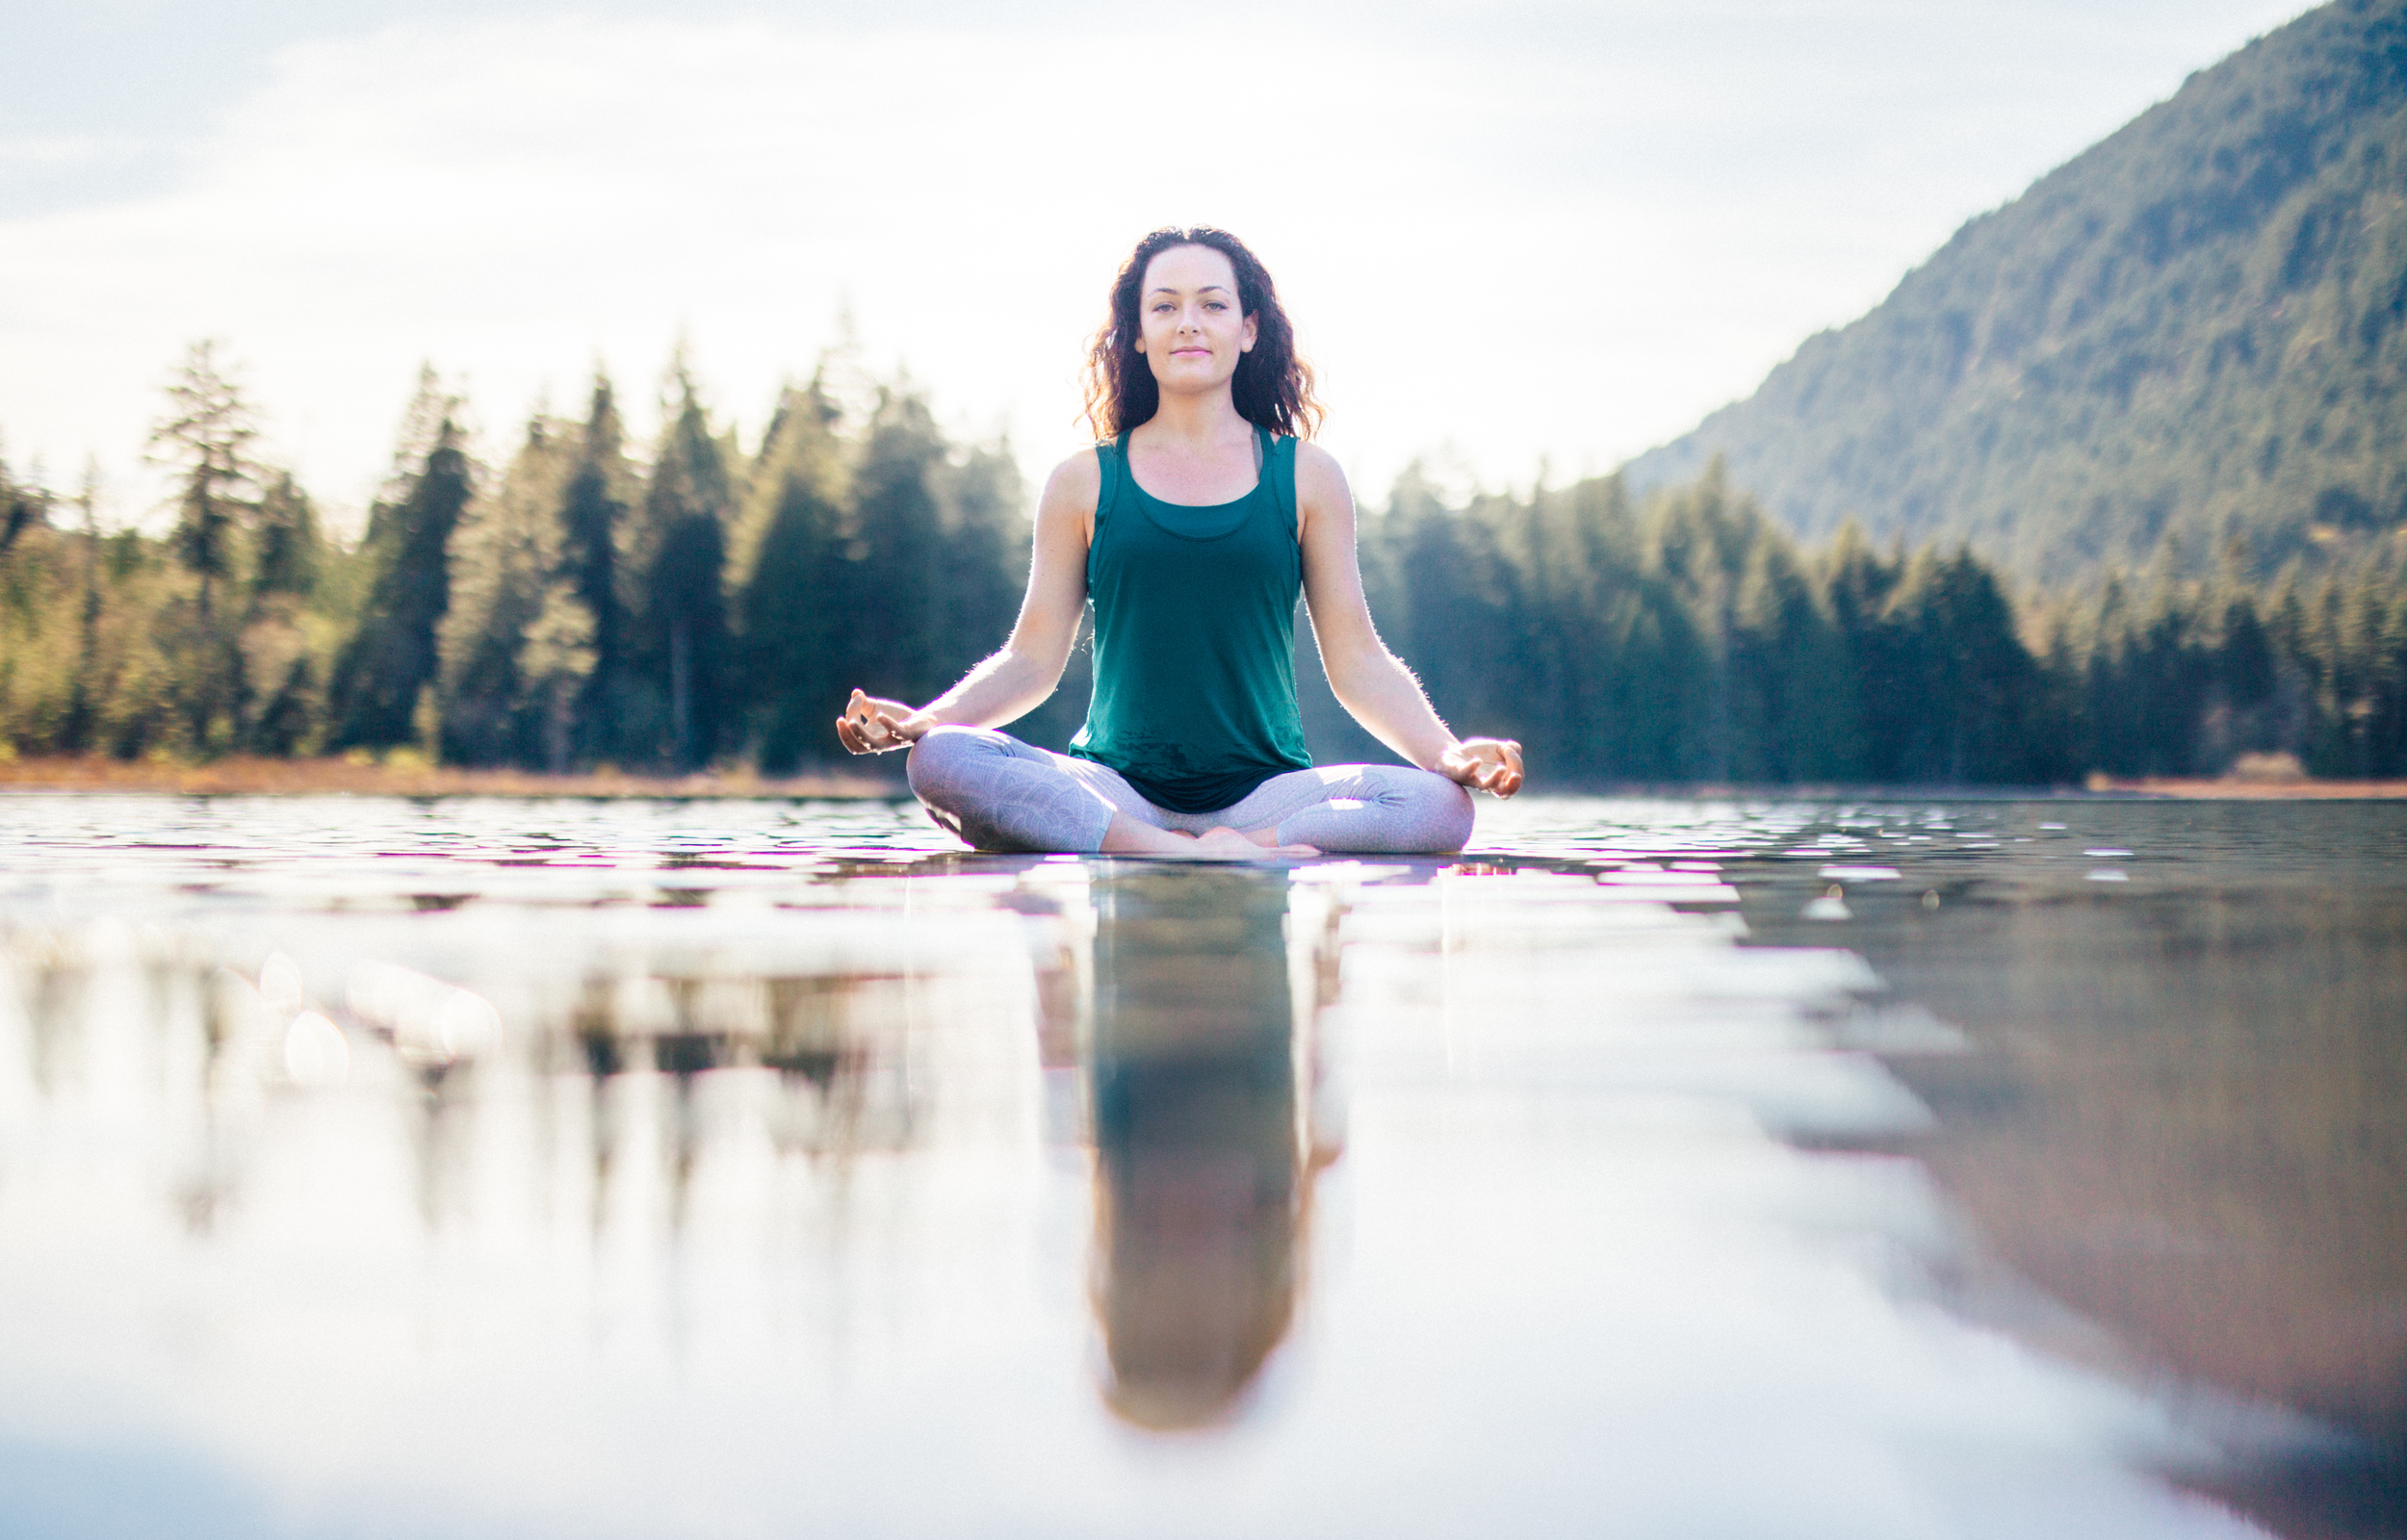 Andrea Clark, owner of Nectar Yoga B&B. Photo courtesy of Nectar Yoga.